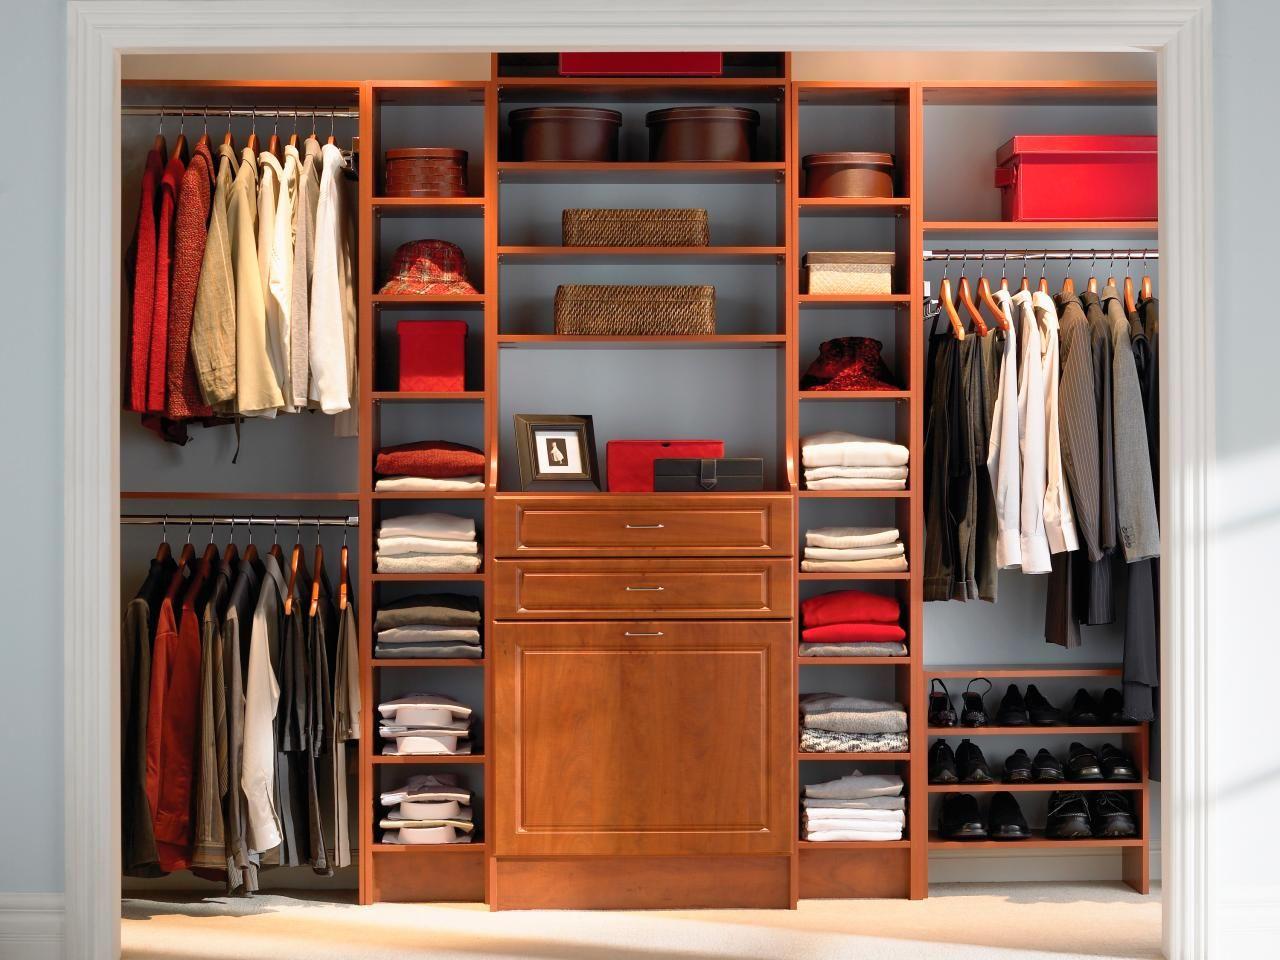 Master Closet in Warm Colors | Bedroom organization closet, Closet bedroom,  Closet designs